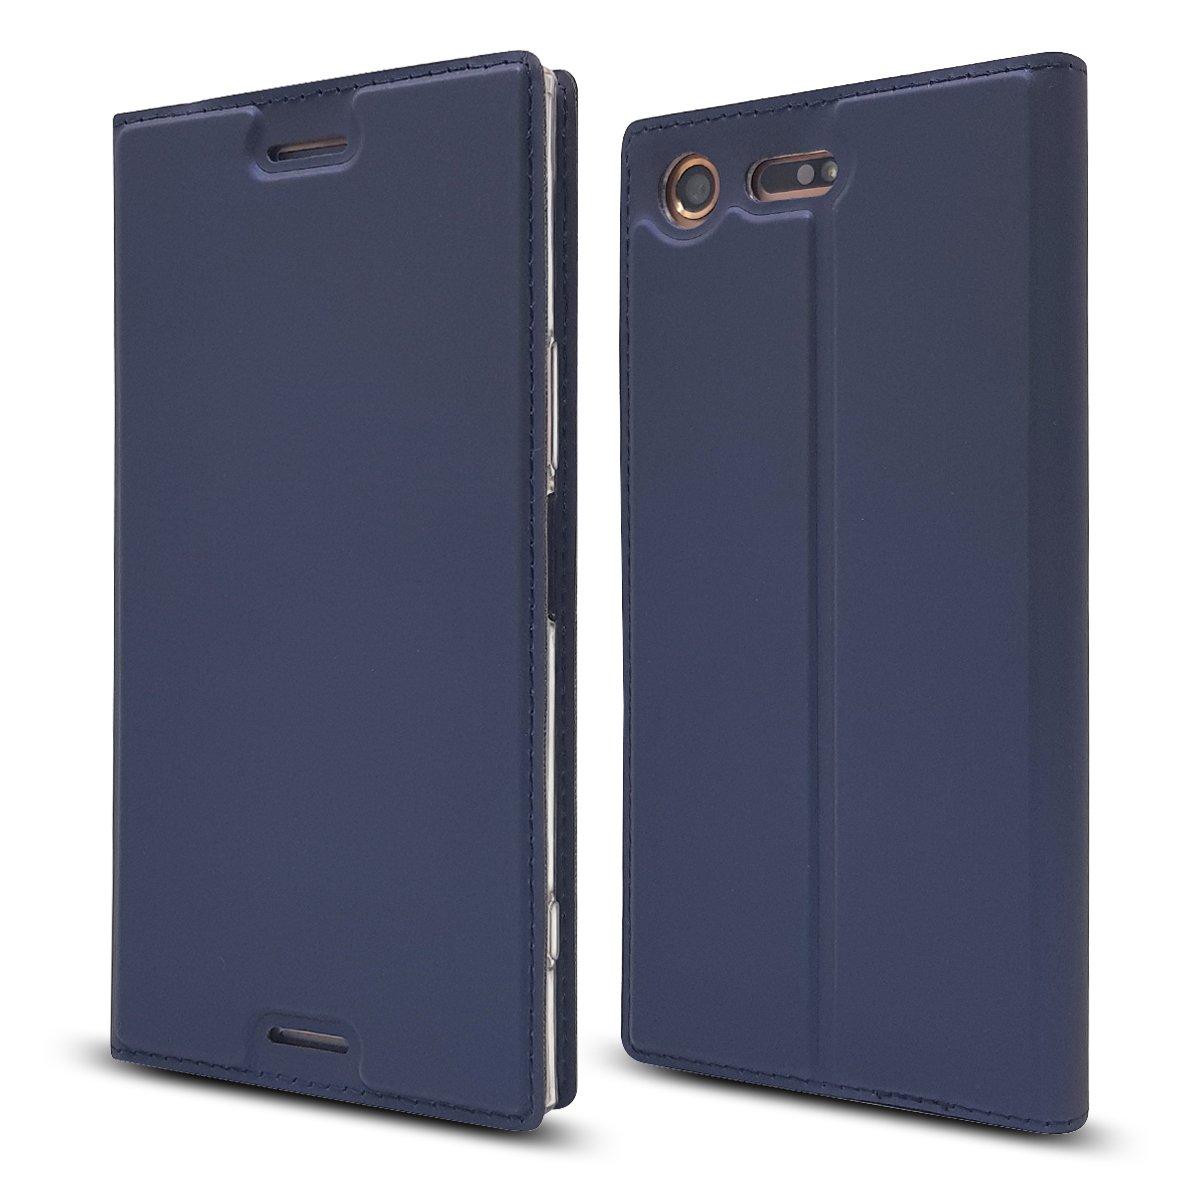 Cellphones & Telecommunications For Huawei Xiaomi Samsung Eu Charger Adapter For Sony Xperia L1 L2 Xa1 Xa2 Ultra Xa3 Plus Xz Xz1 Xz2 Compact 1m Usb Type C Cable